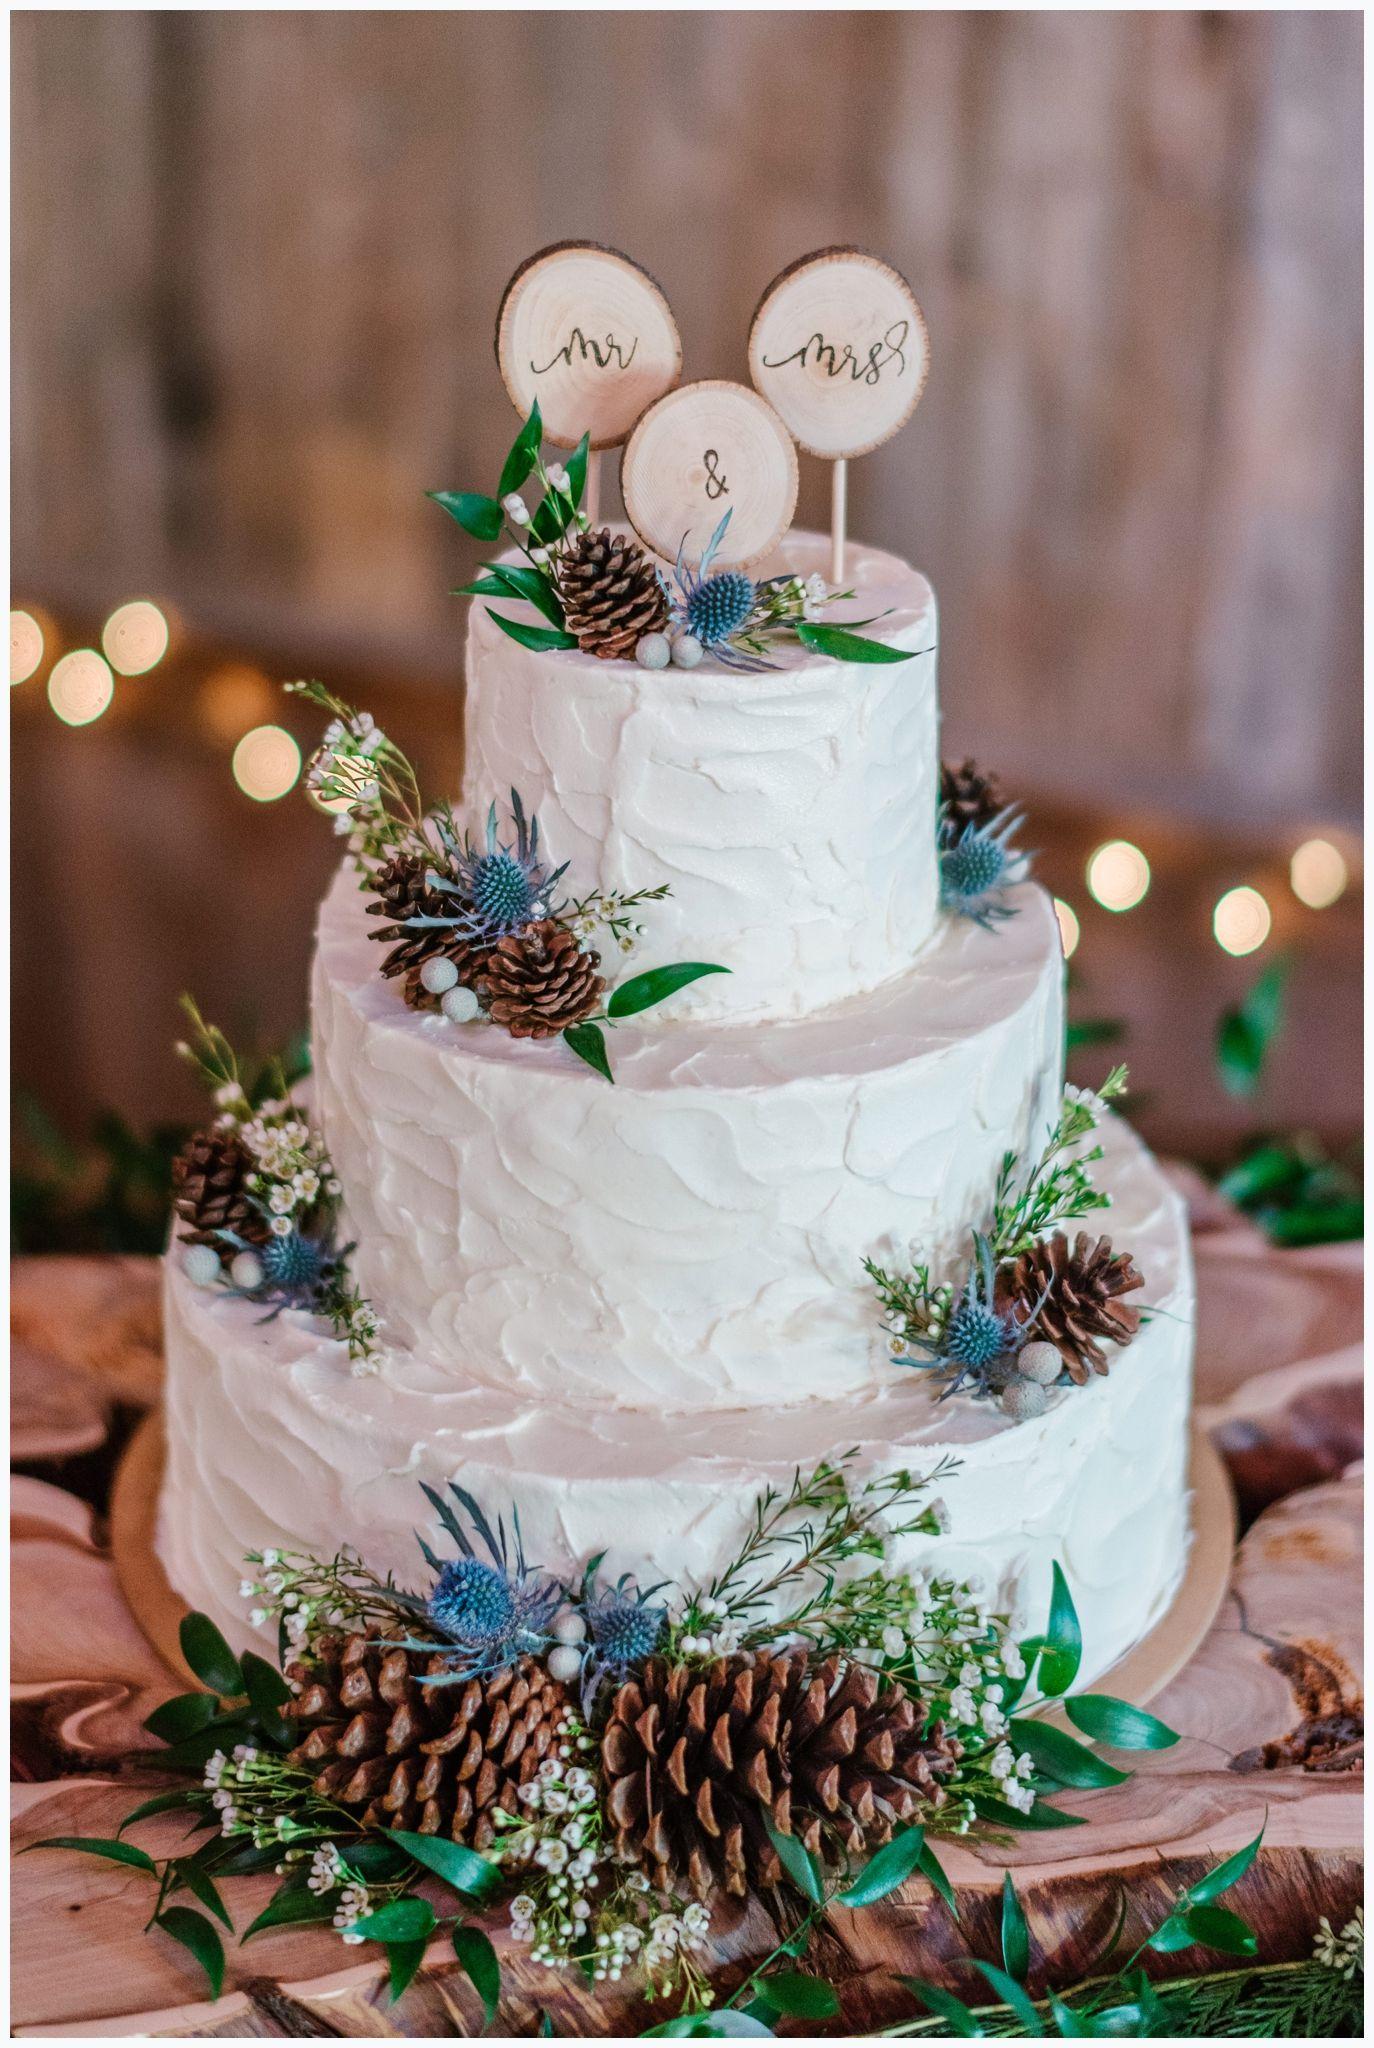 Rustic Wedding Cake Rustic Wedding Cake Austin Wedding Photographer Wedding Desserts